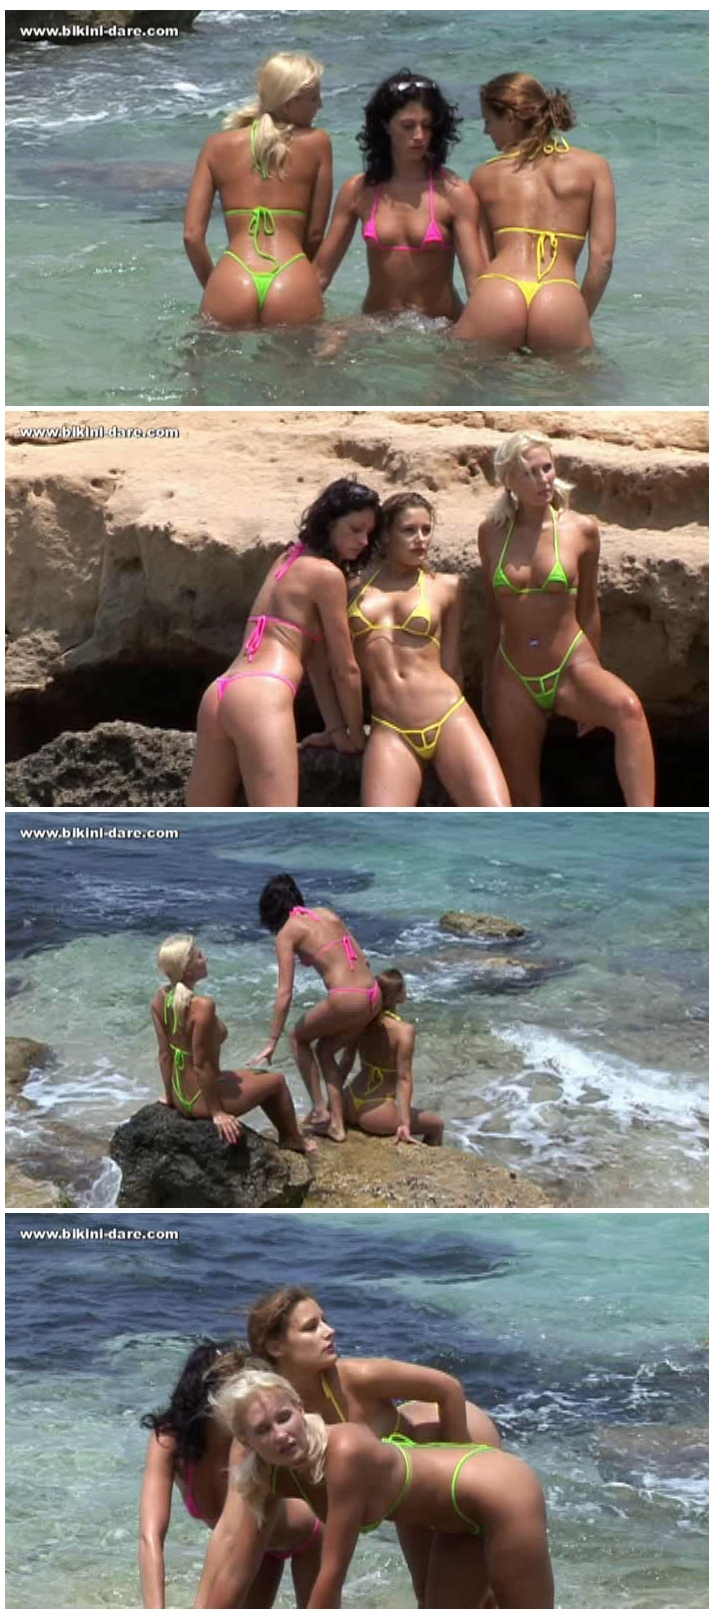 bikini-dare111_cover.jpg